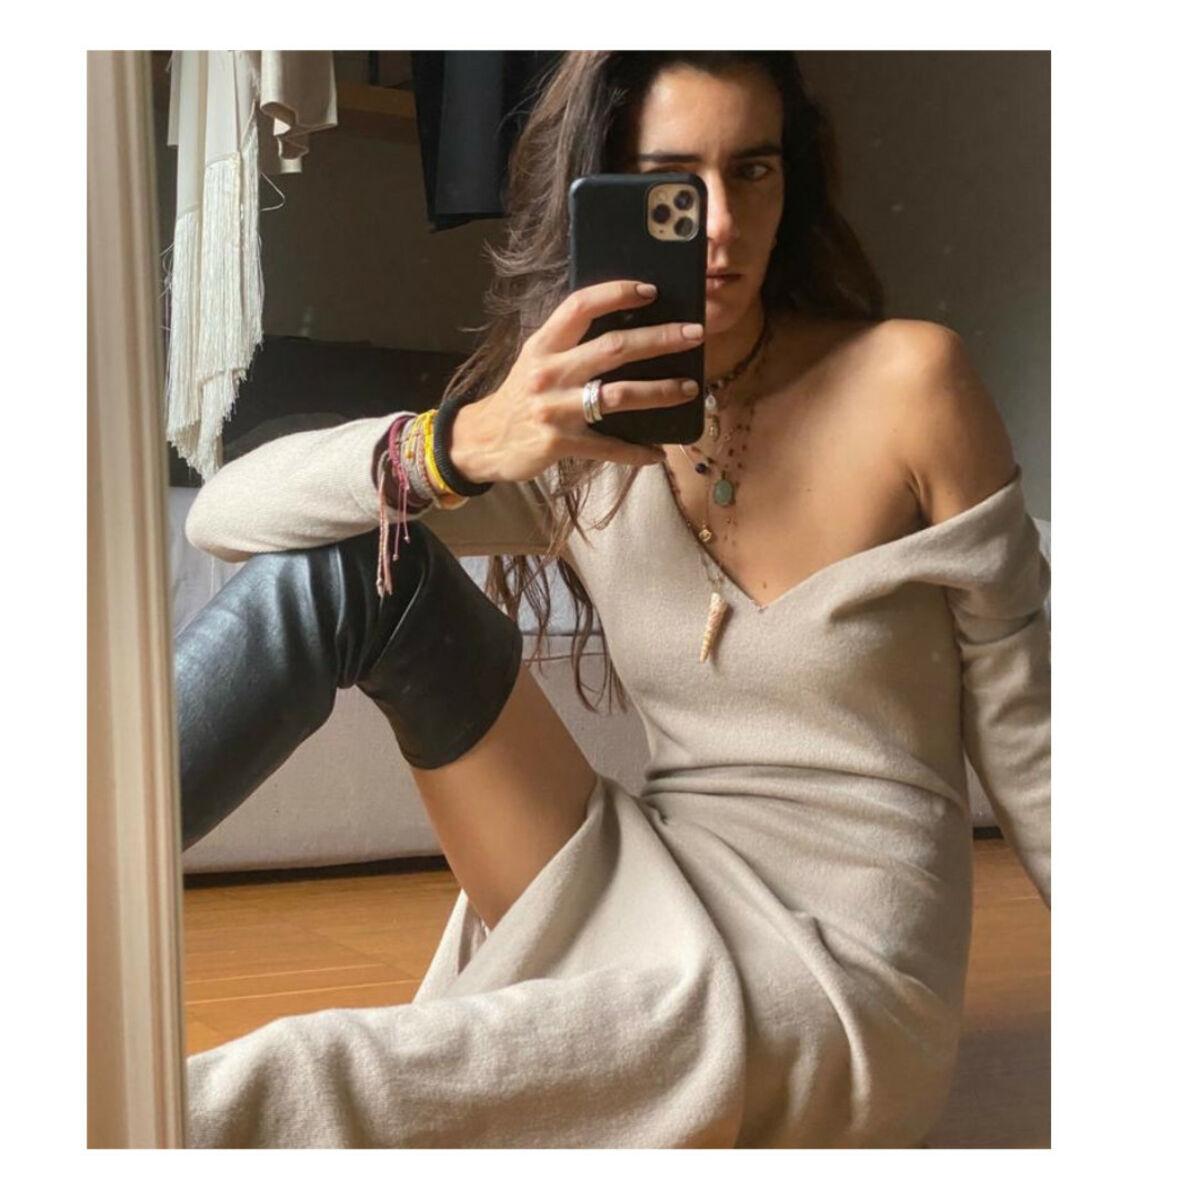 CHIARA TOTIRE (EVA DRESS)